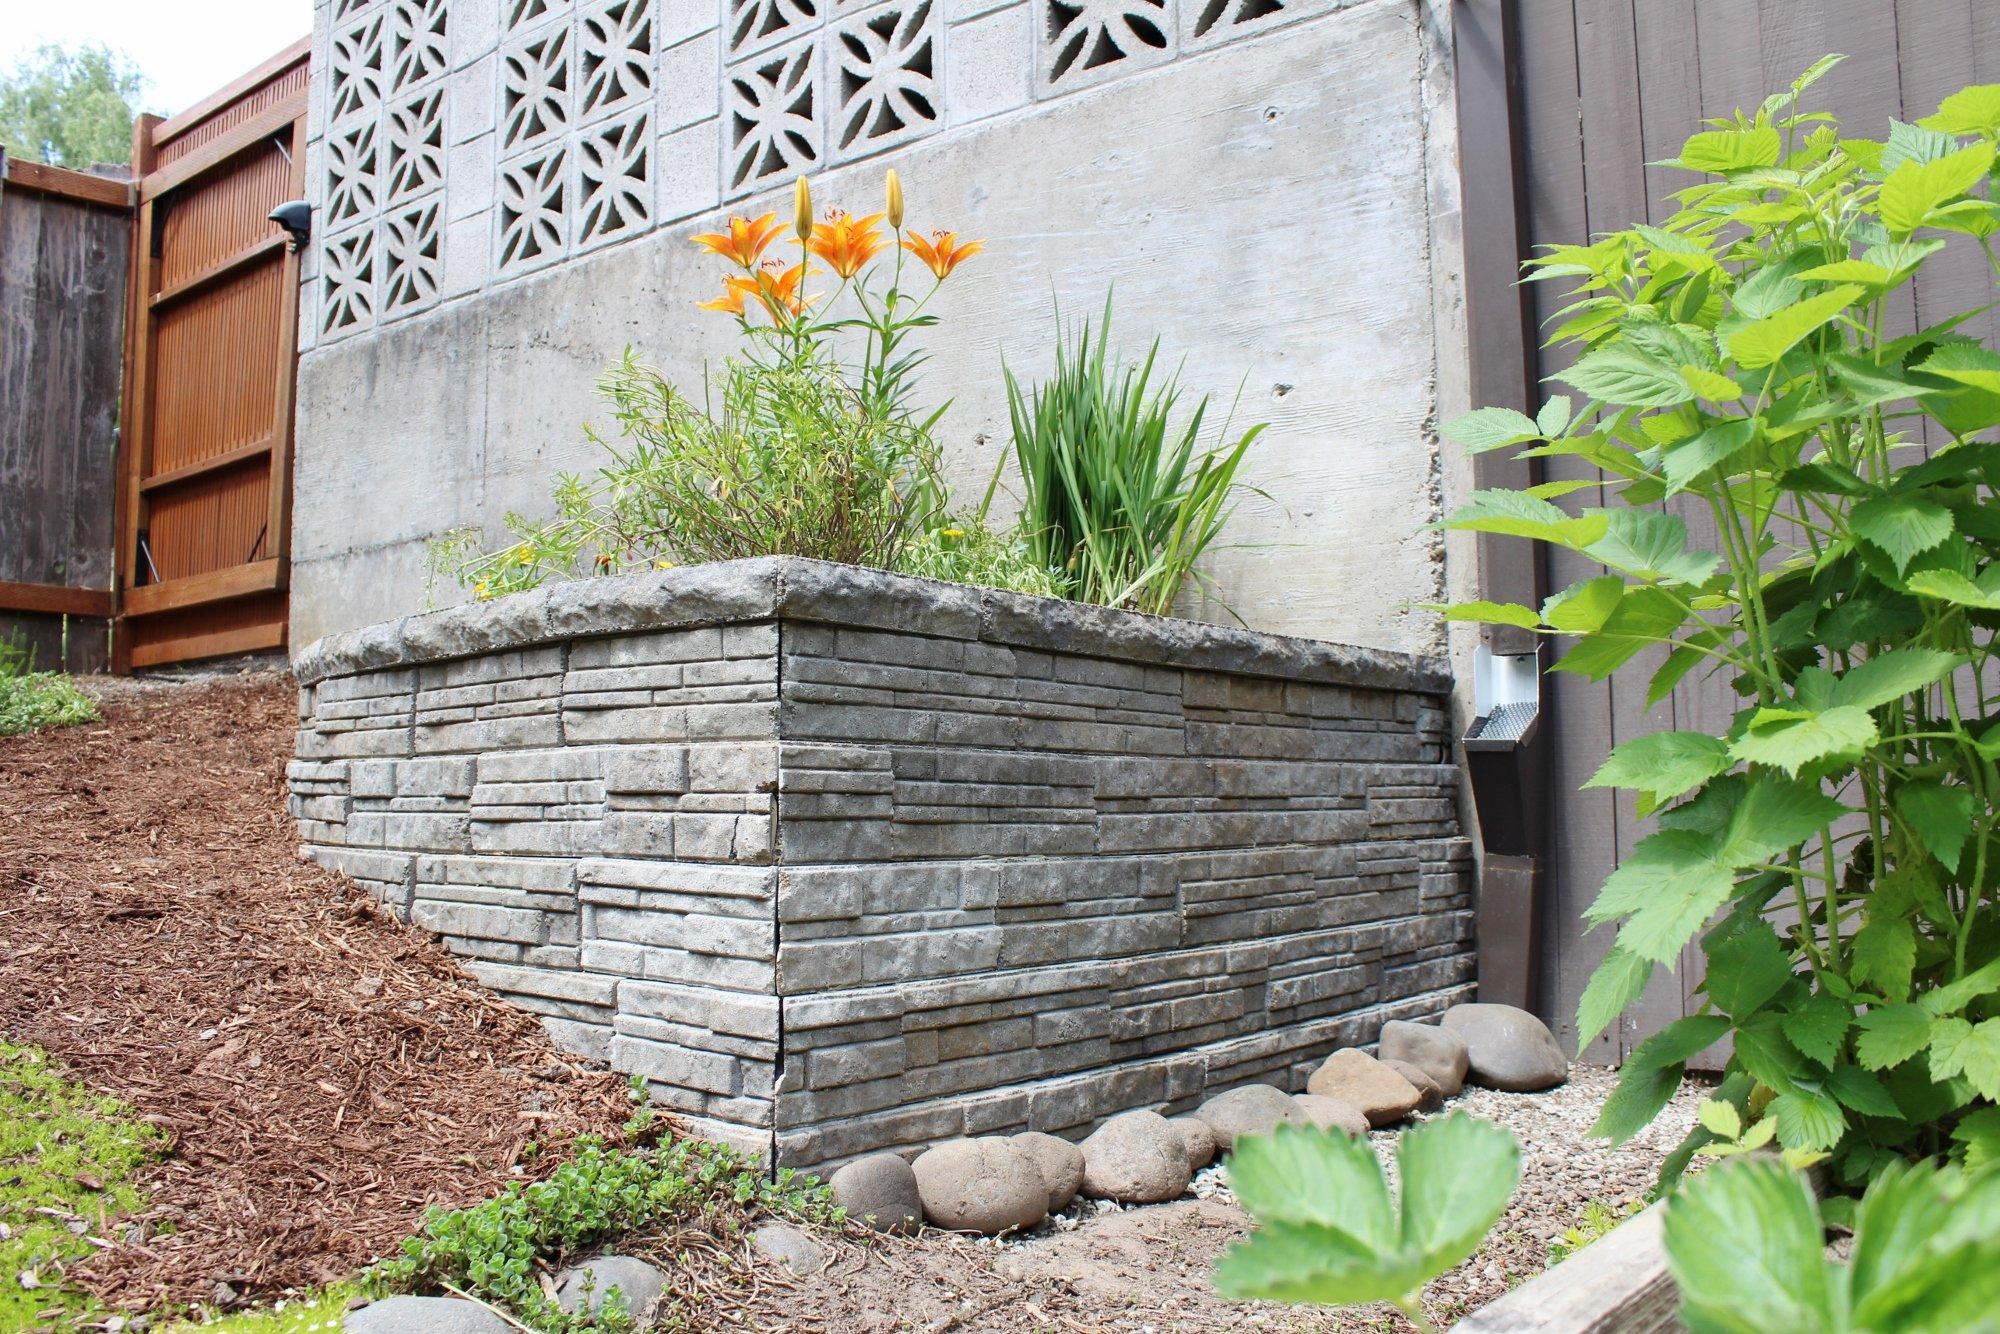 Modern retaining wall blocks for mid-century planter in backyard